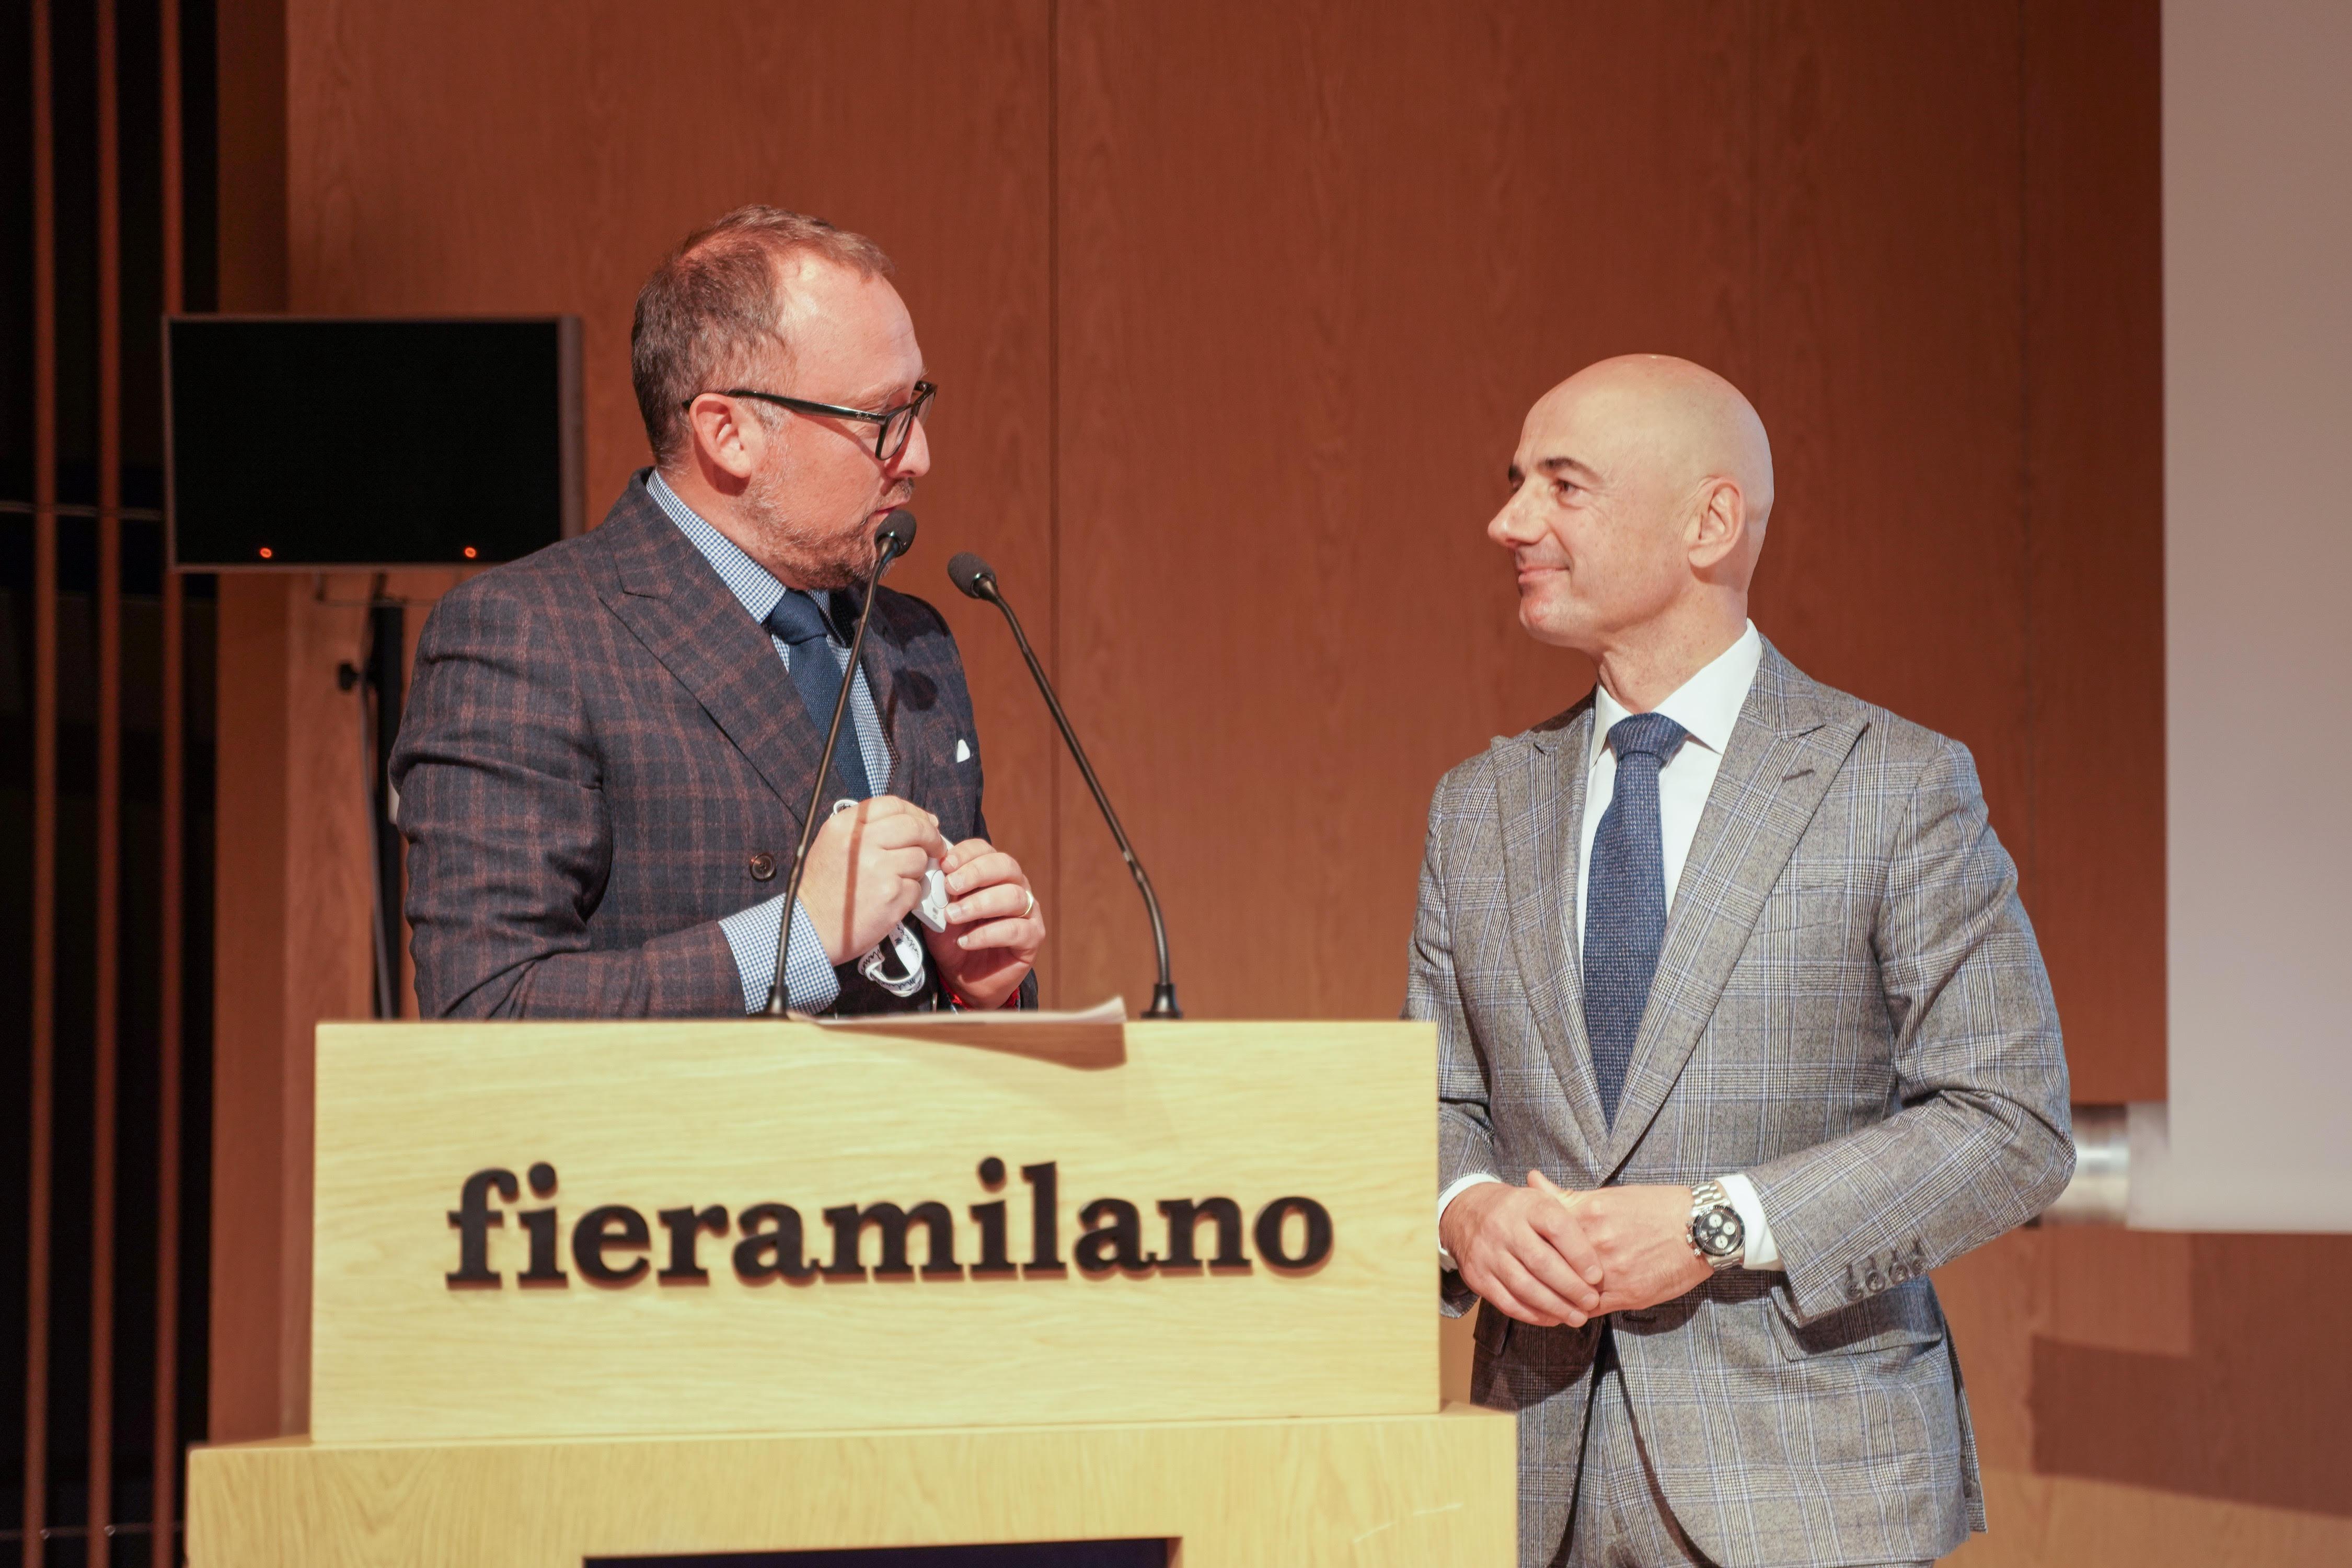 Barberis Canonico Is The New Chairman Of Milano Unica